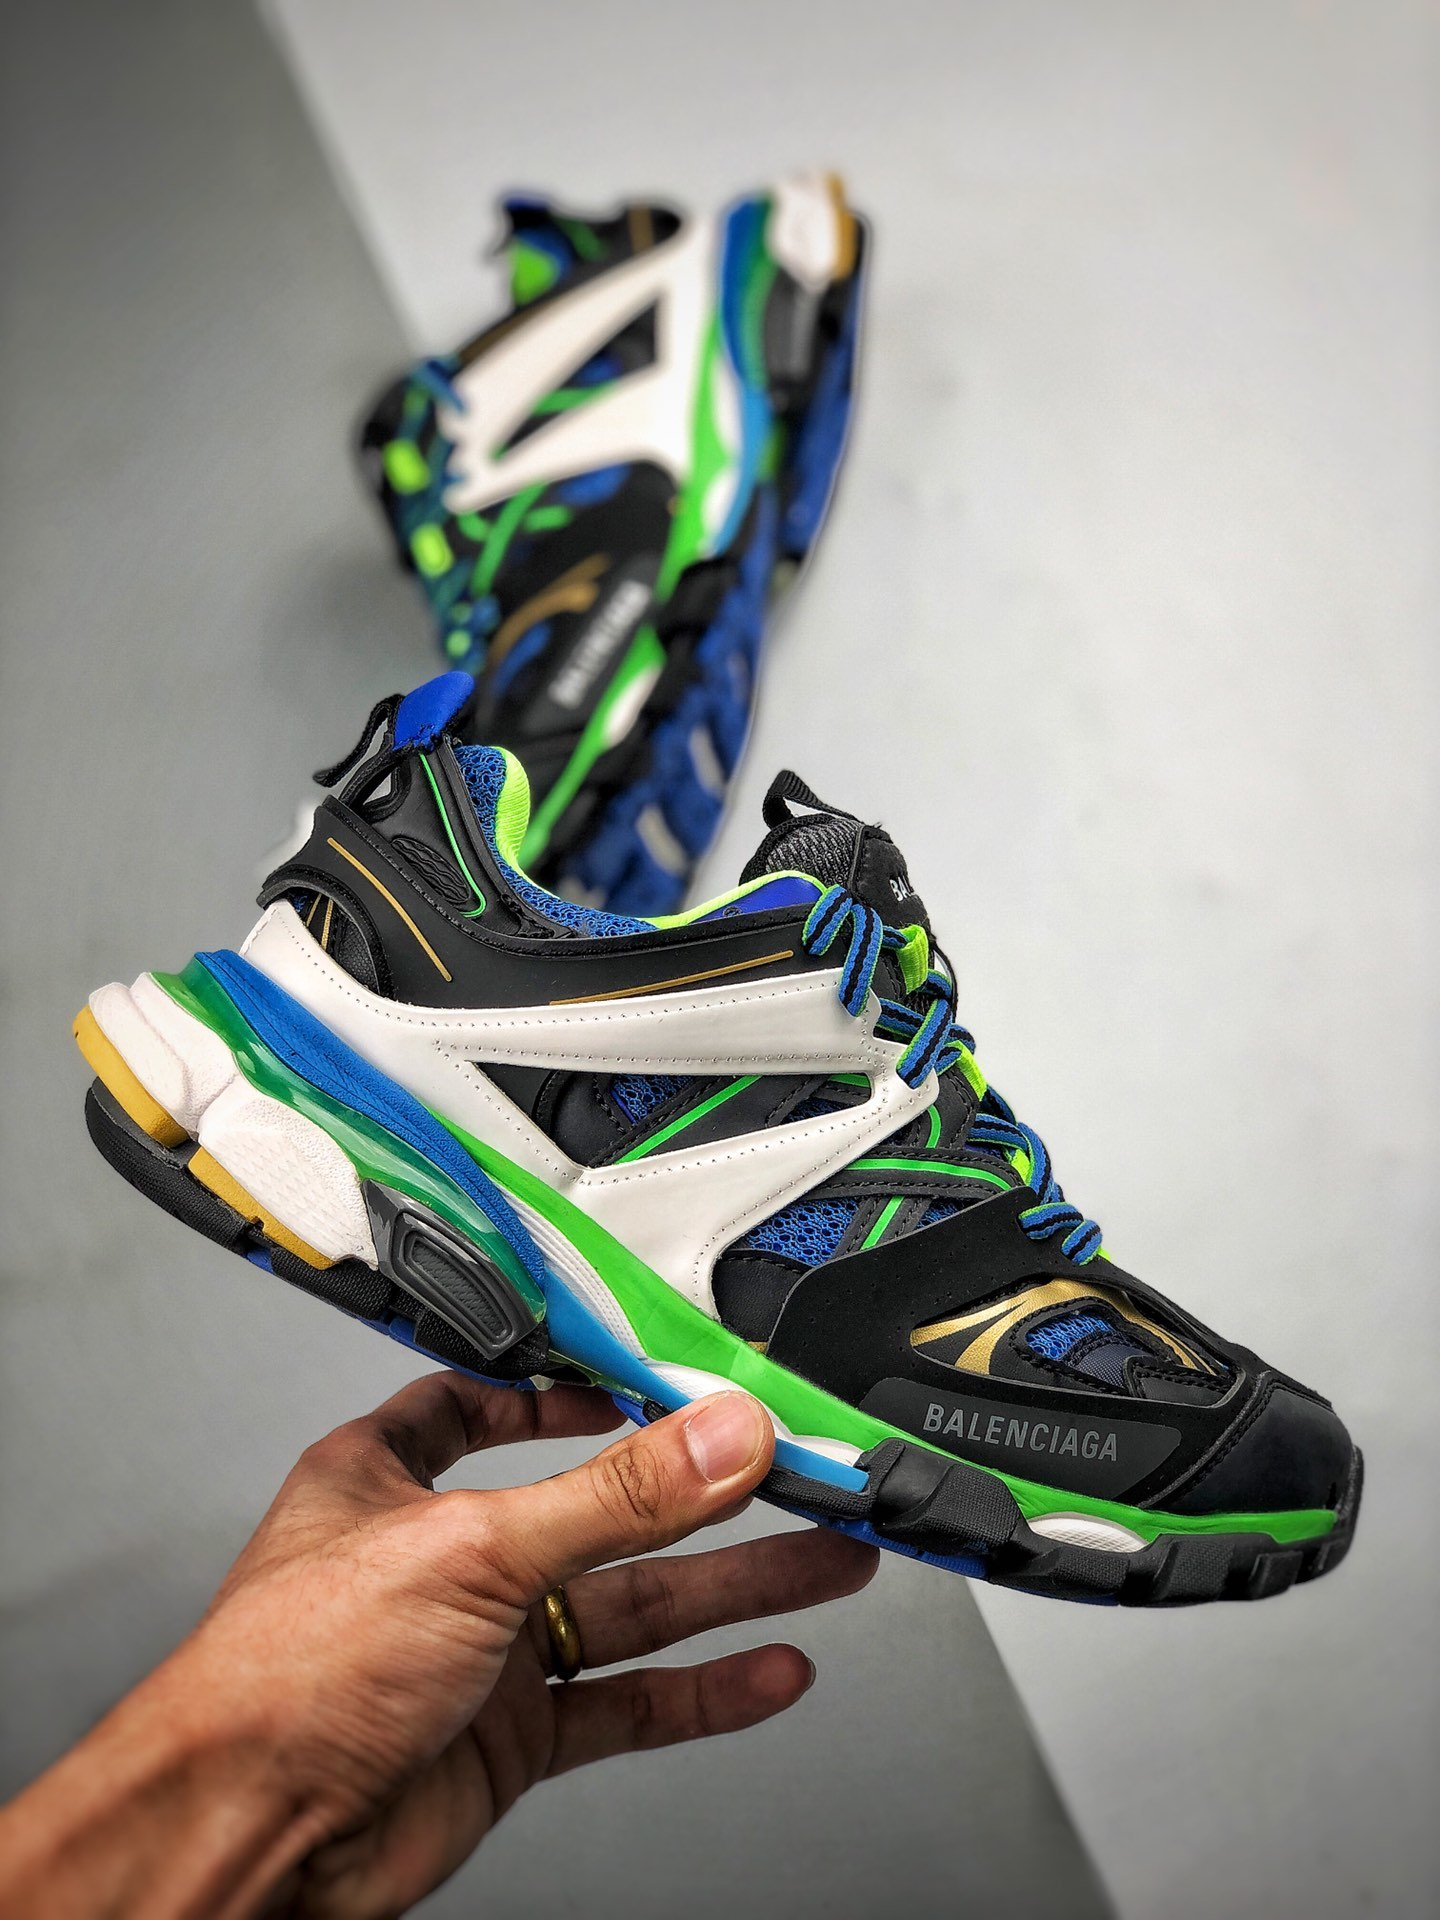 S2纯原巴黎世家-Balenciaga 3.0 Sneaker Tess.s. Gomma MAILLE 黑绿 原版原_s2纯原yeezy500